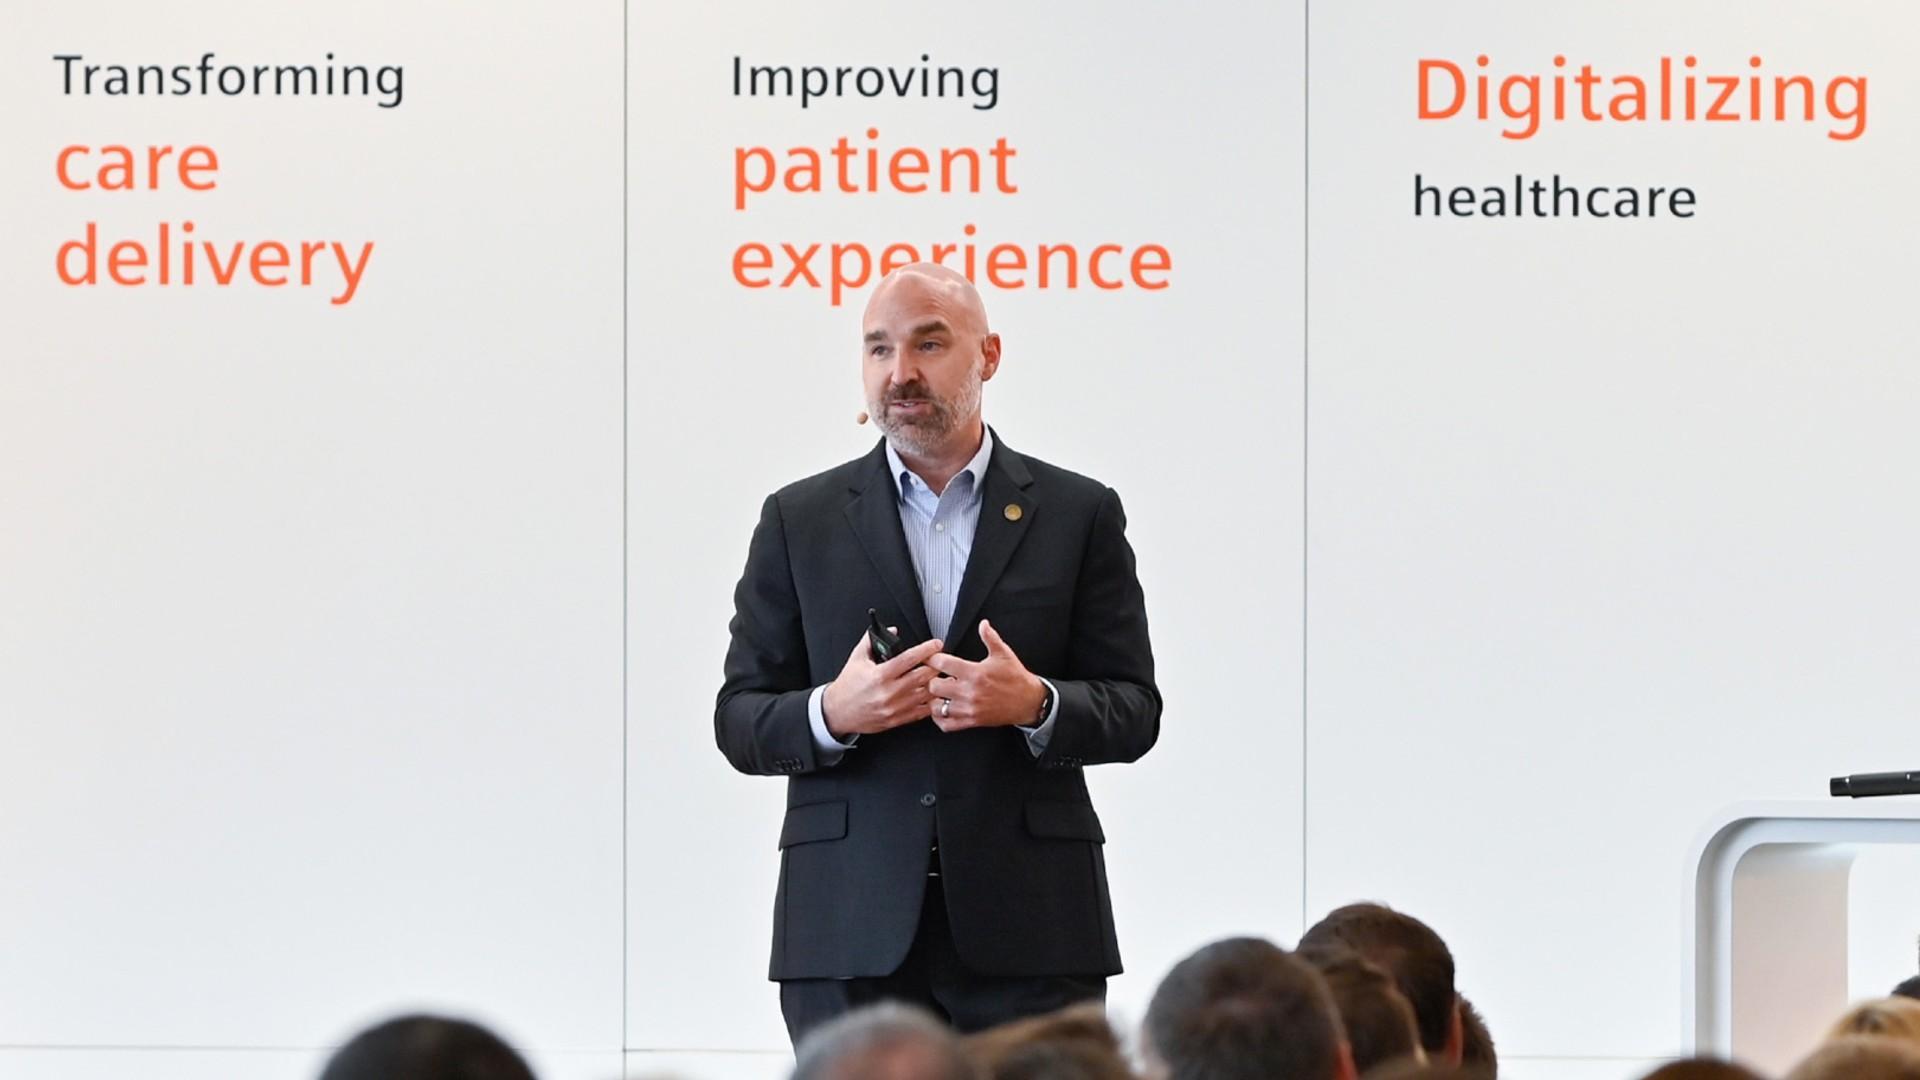 Jason Wolf at the Siemens Healthineers Talks